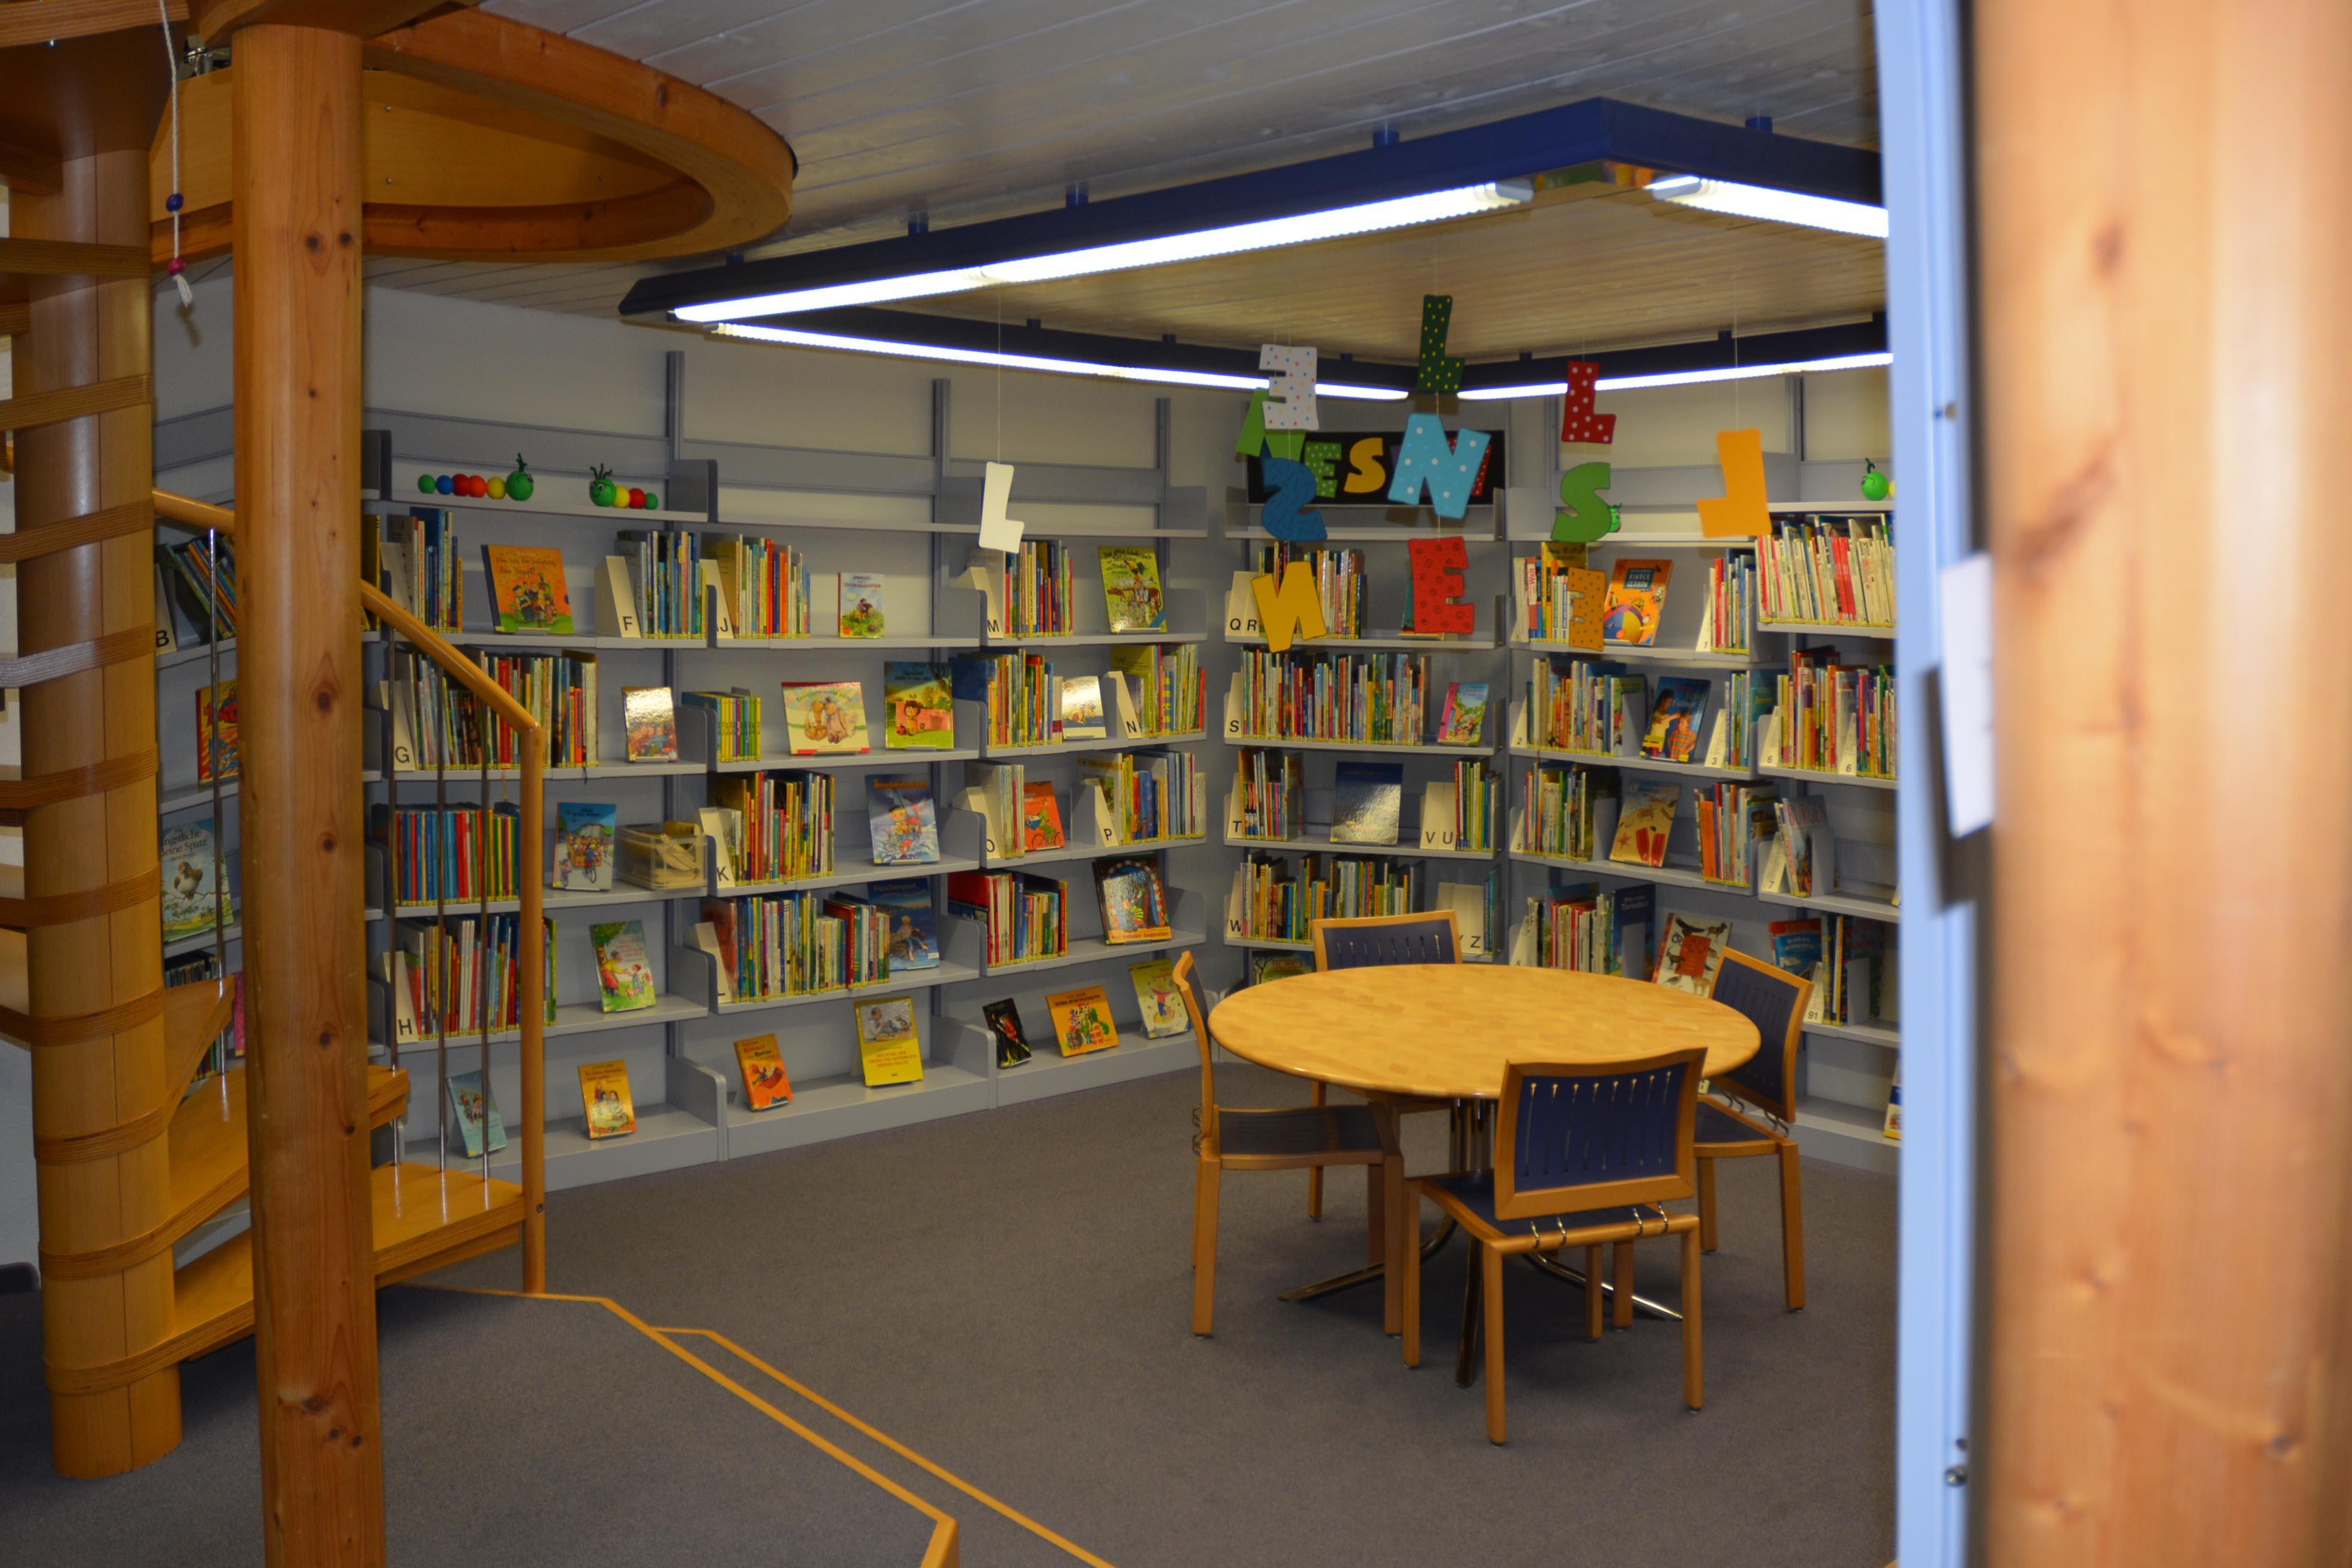 Umbau Bibliothek Schulbibliothek Kaltbrunn Bücher Lesen Planung Ronner Architektur Bauleitung Kinder Umbau alt altmodisch